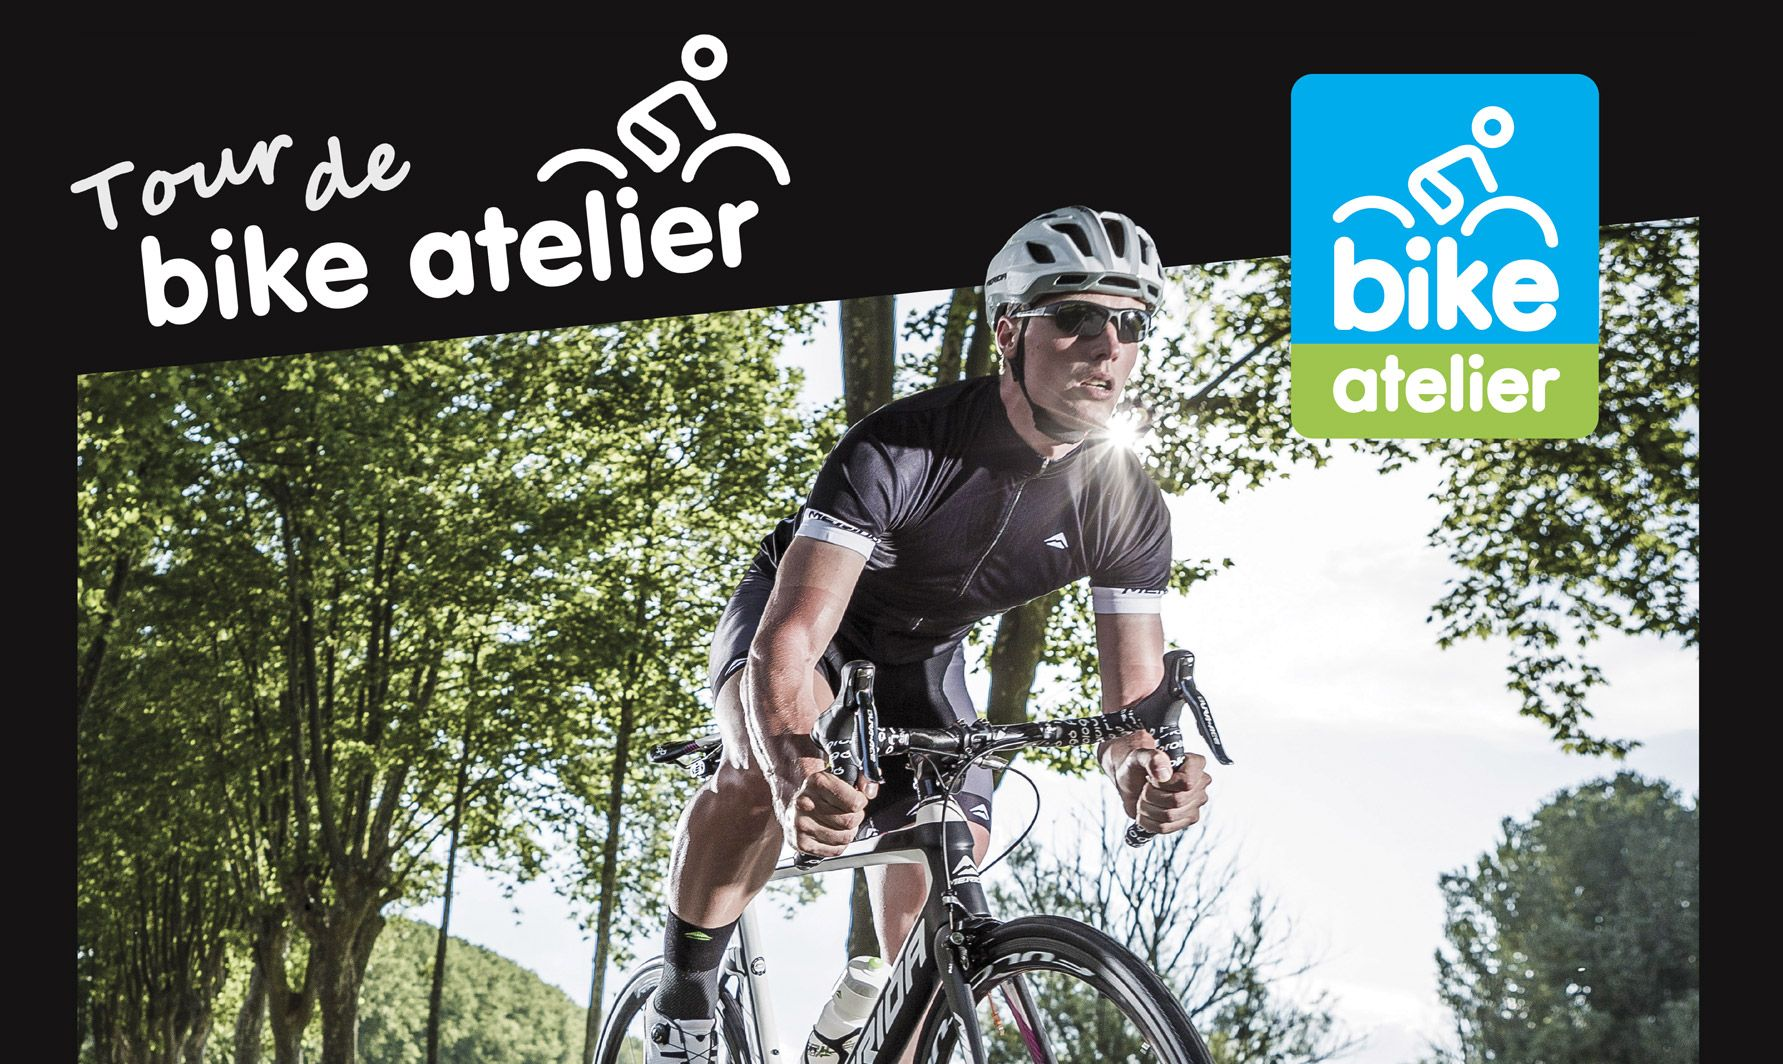 Rusza sezon na trenażer – startuje Tour de Bike Atelier